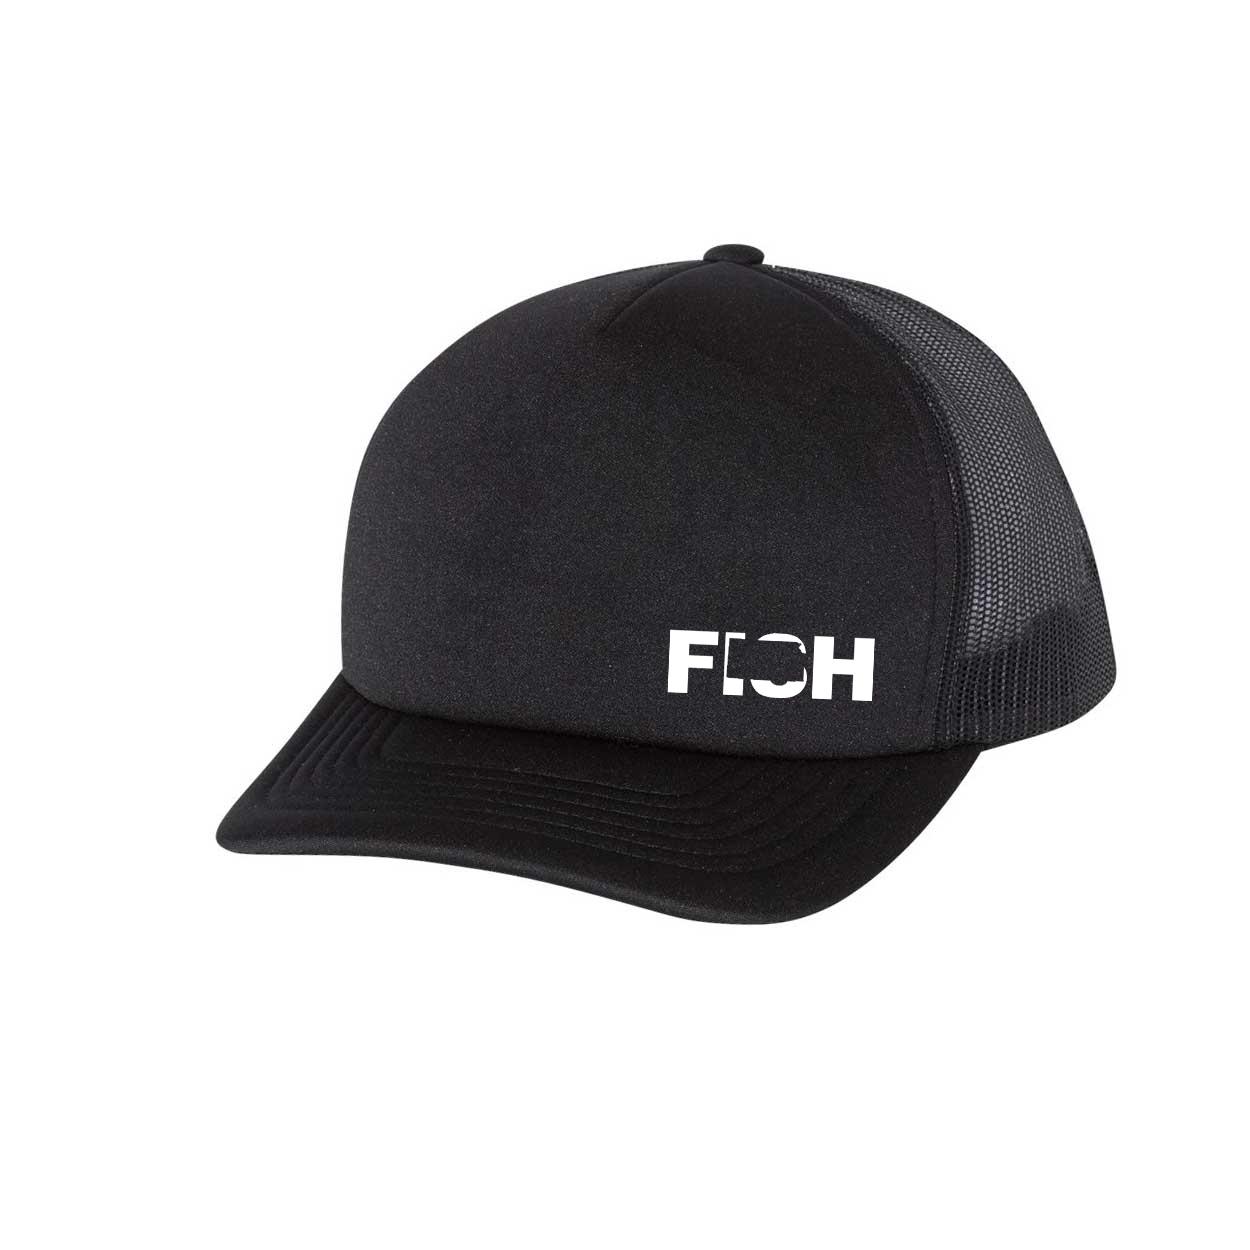 Fish Kansas Night Out Premium Foam Trucker Snapback Hat Black (White Logo)